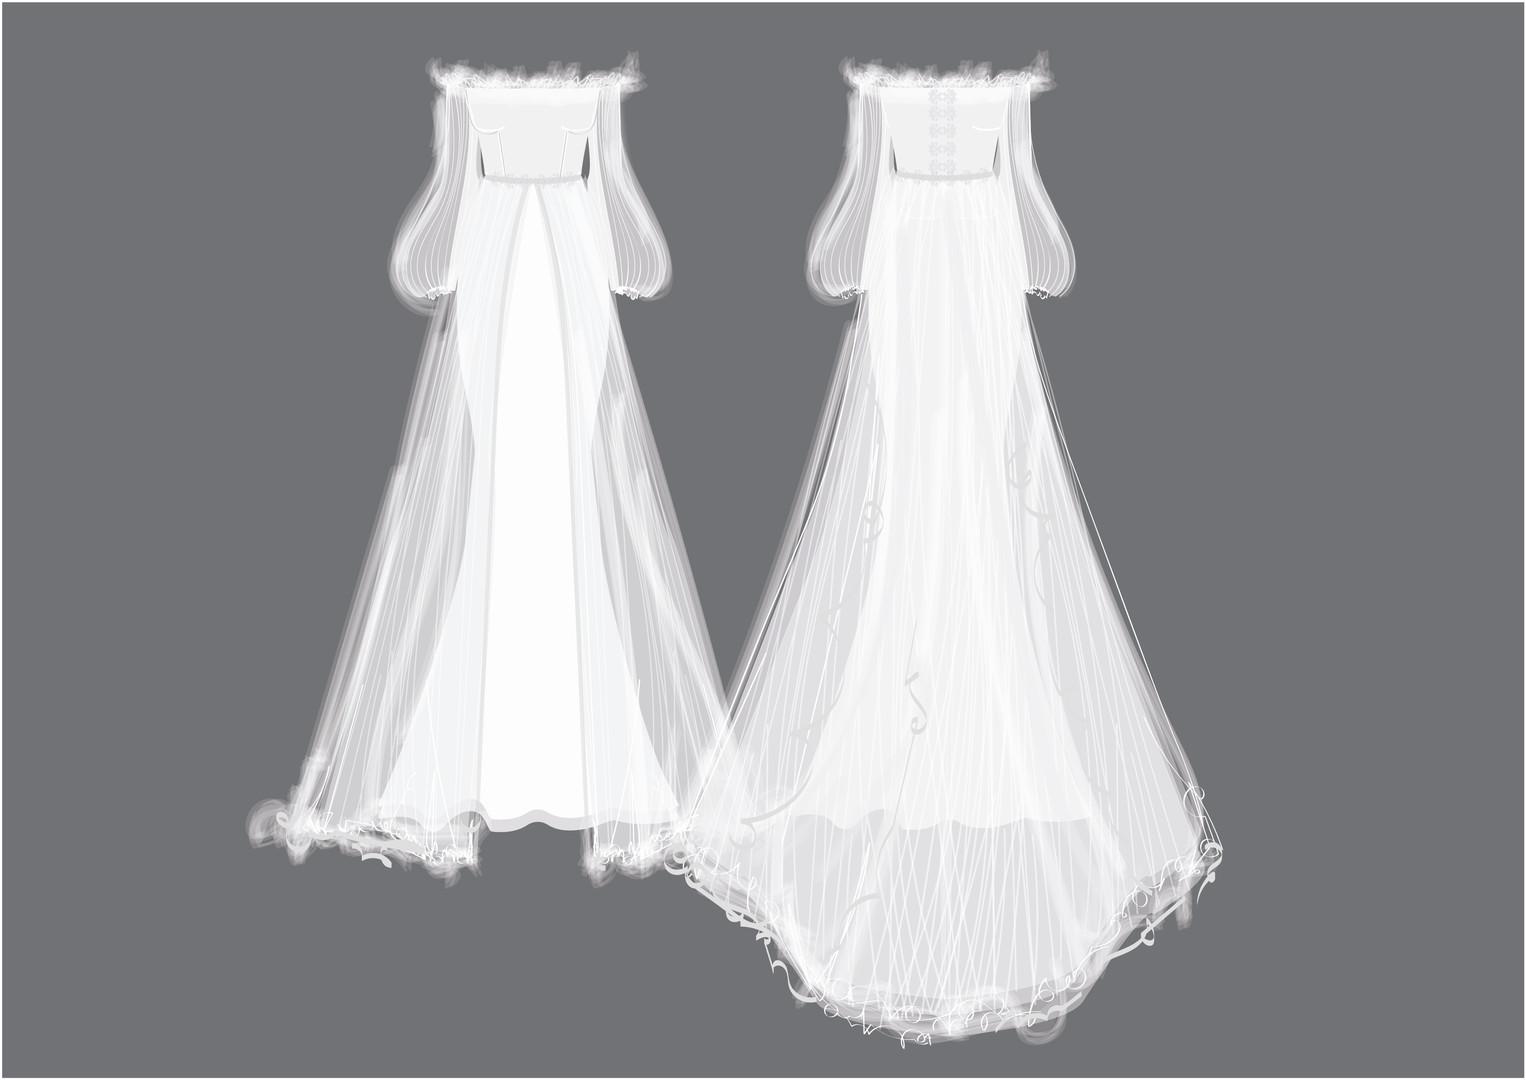 Gino Cerruti Wedding Dress